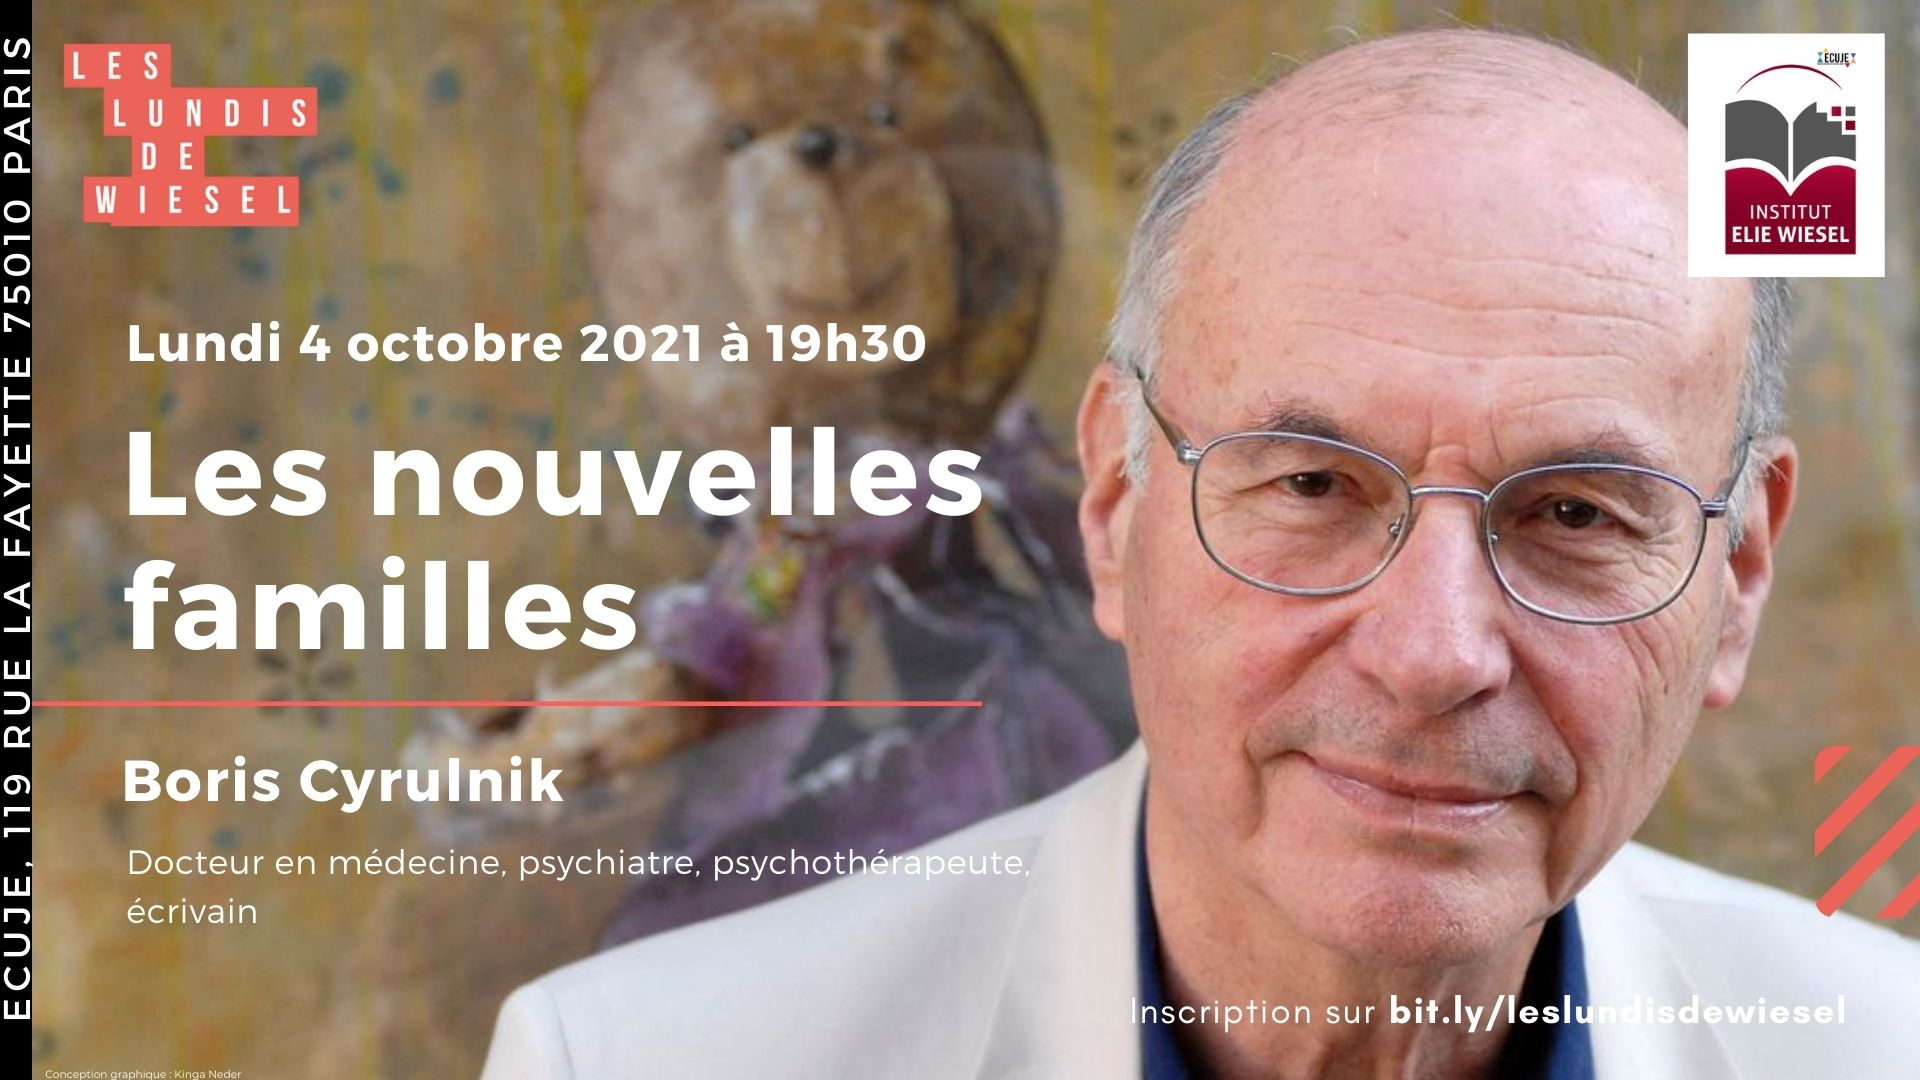 Conférence de Boris Cyrulnik, neuropsychiatre